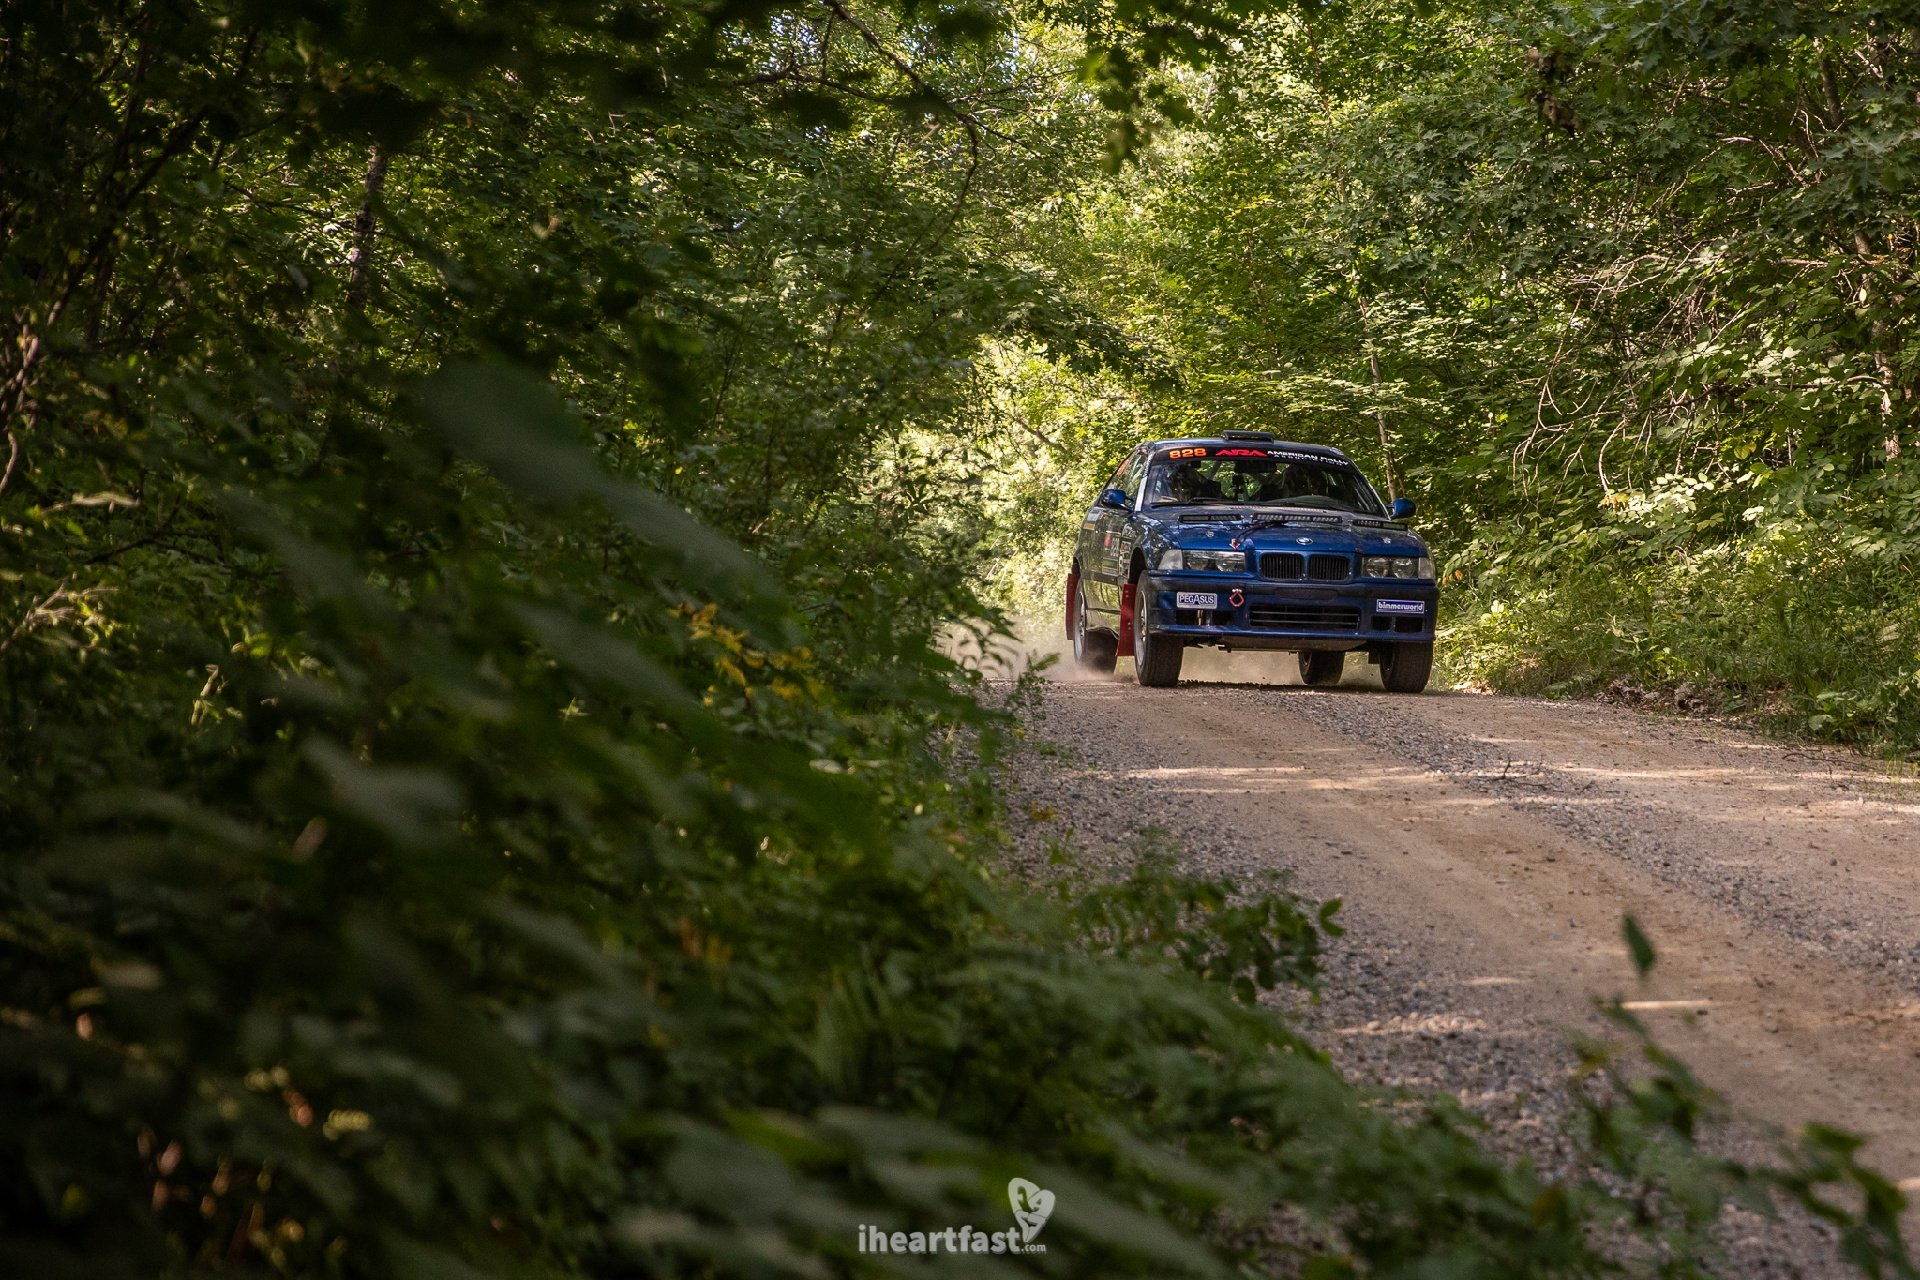 Beareded Ryno Rally Team BMW E36 M3 Rally Car Ojibwe Forest Rally